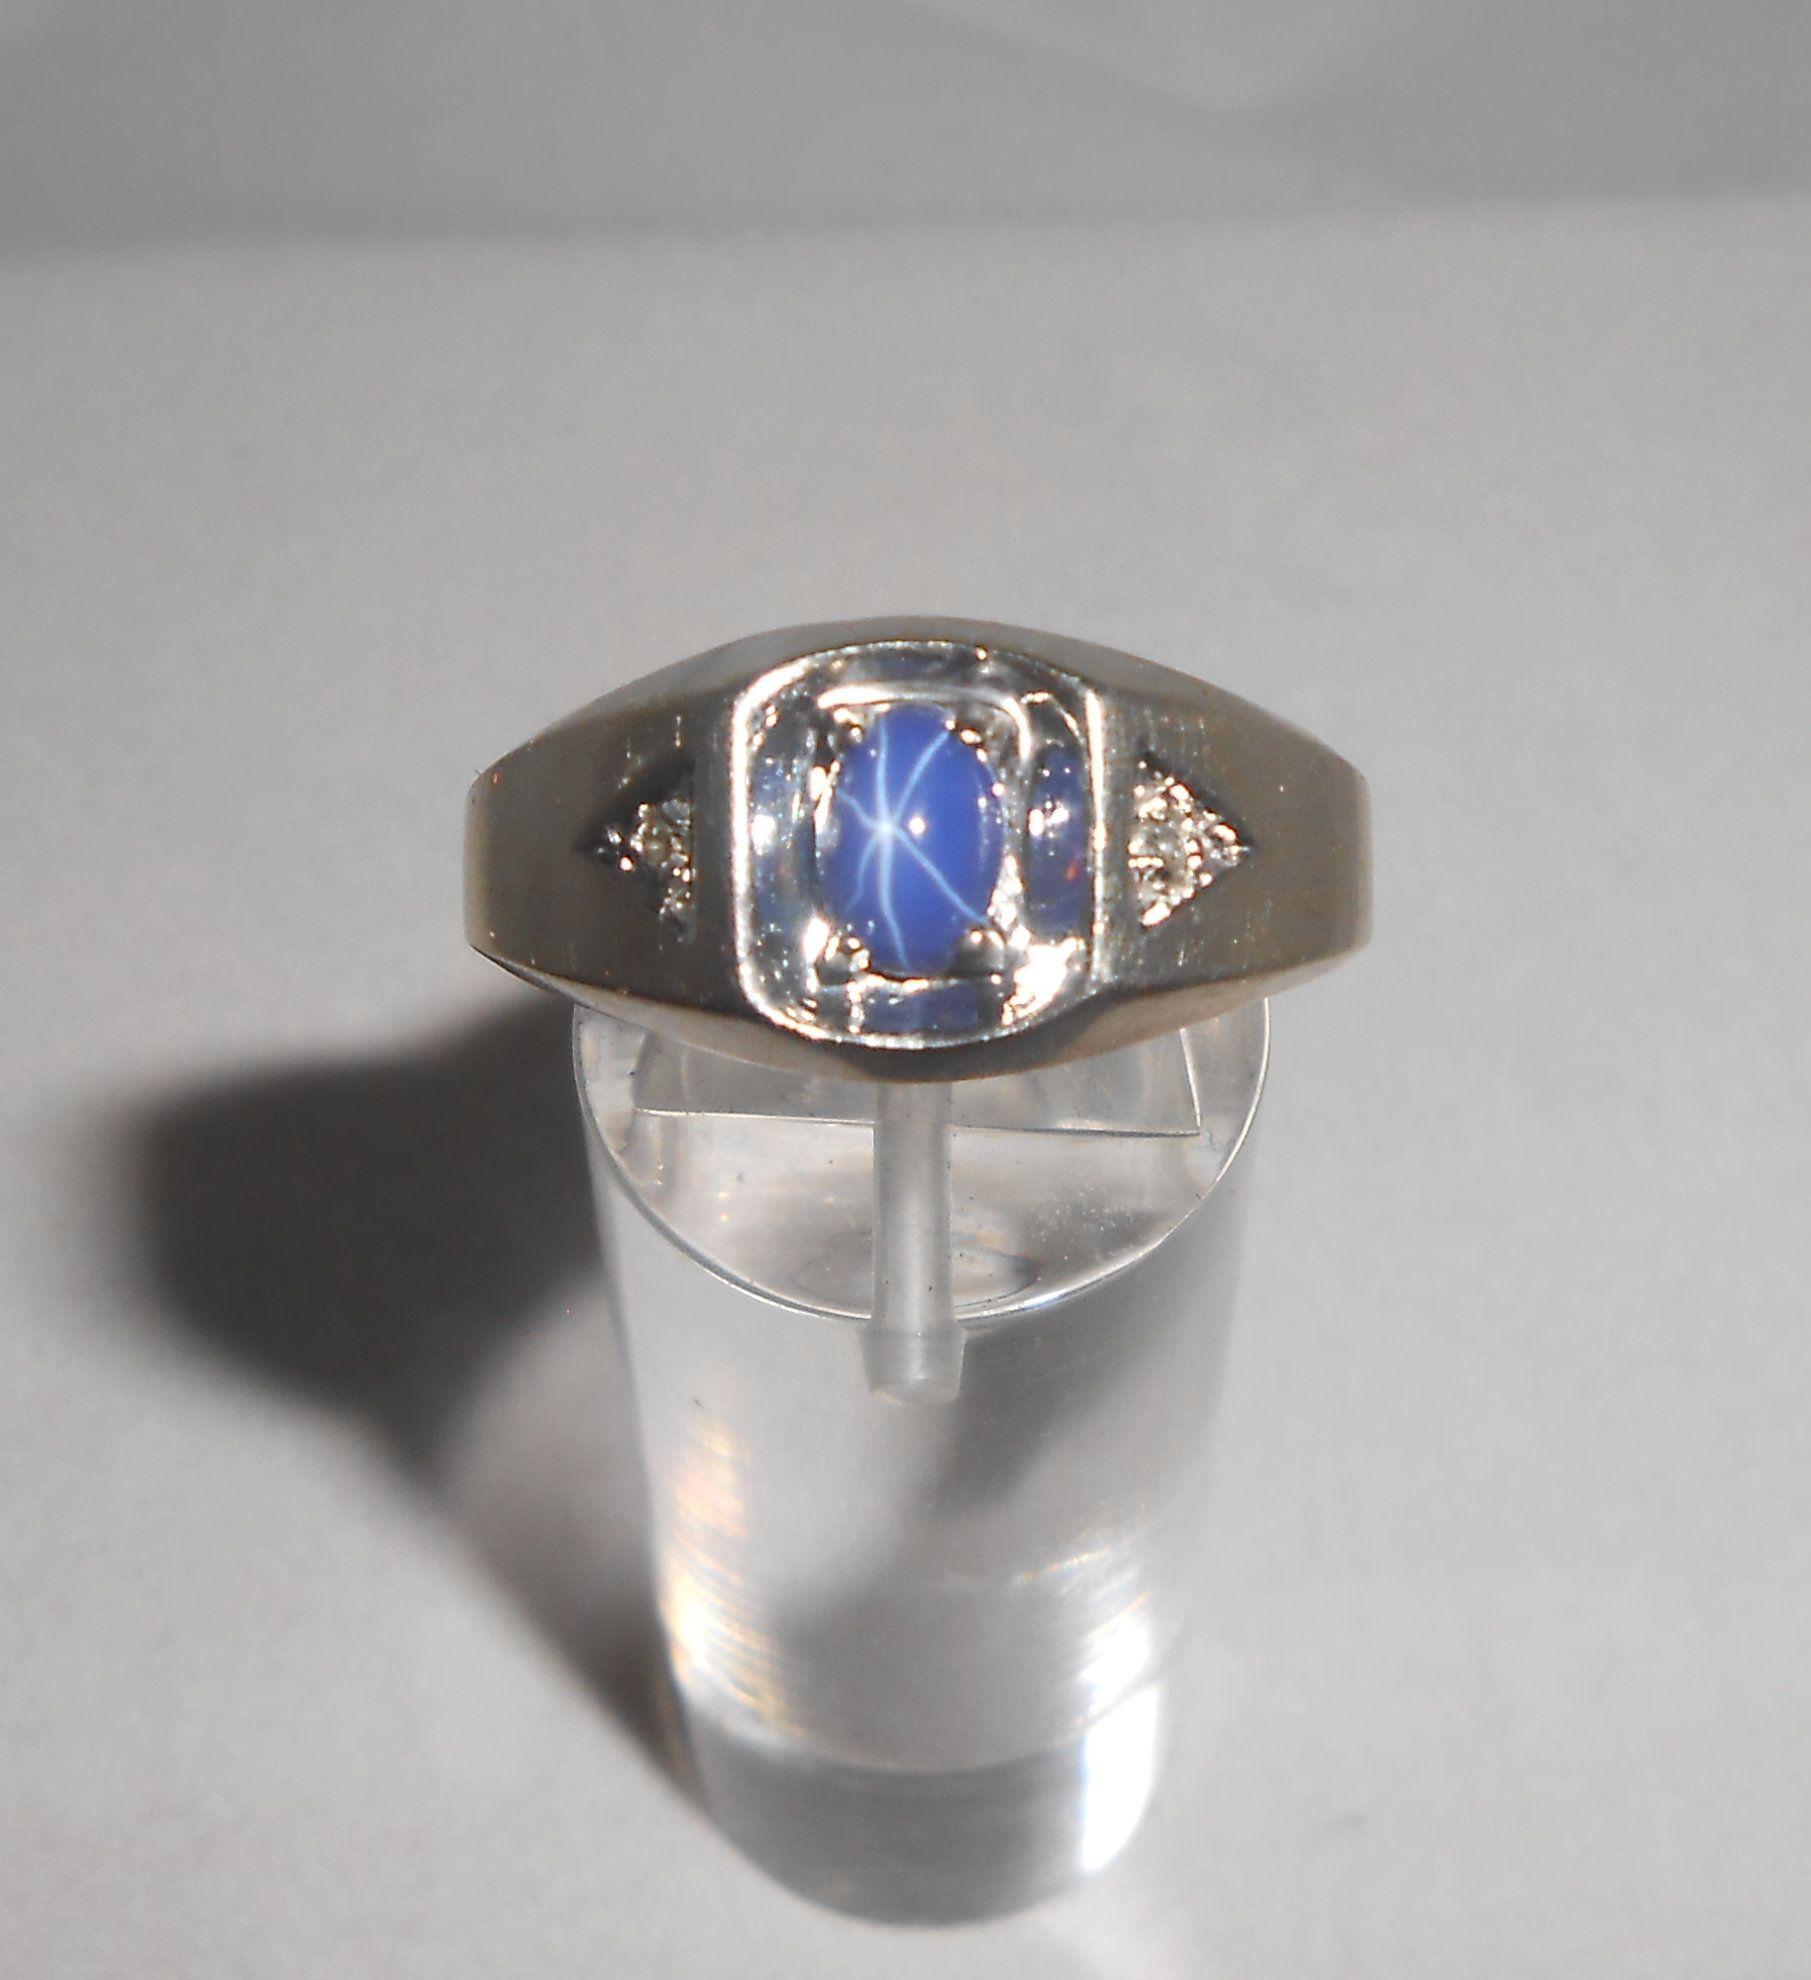 Star Sapphire Ring Gents Ring 10k Gold Ring Men White Gold Ring Diamond Accent Mens Ring Mens Gift Blue Sapphire Ring In 2020 Star Sapphire Ring Mens Gold Rings Blue Sapphire Rings